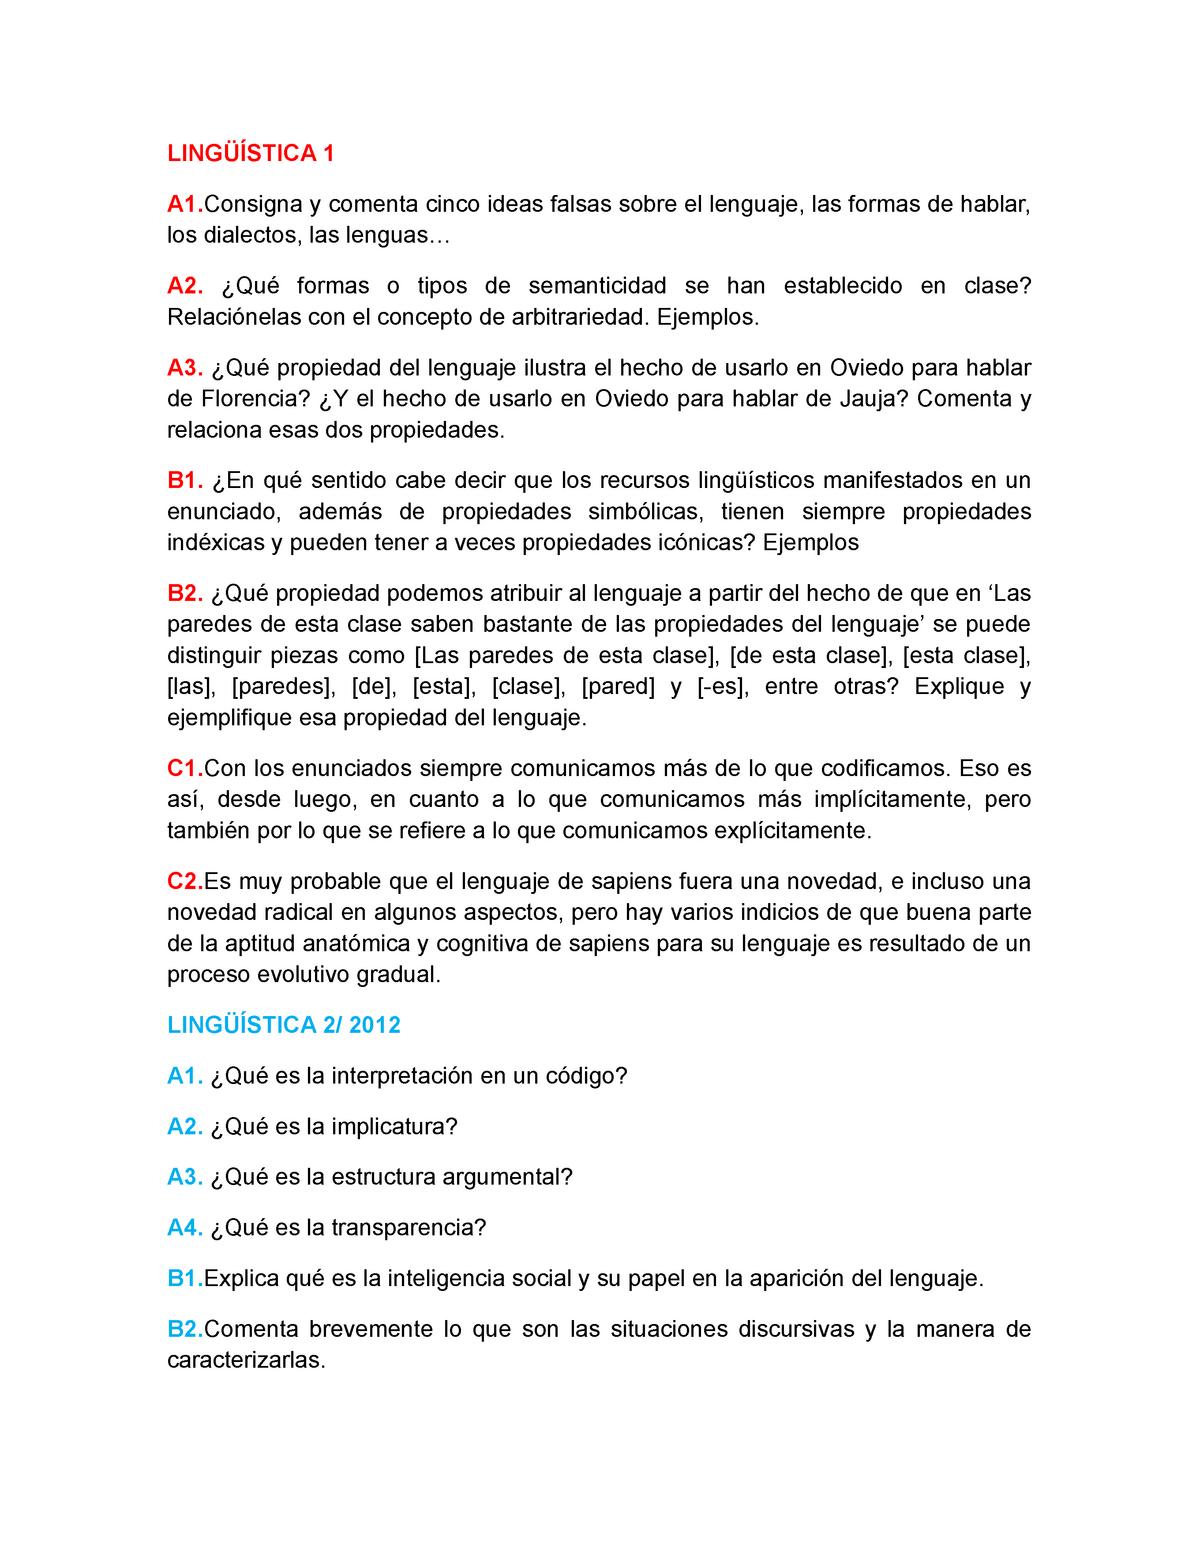 Examen 29 Mayo 2018 Preguntas Lingüística Uniovi Studocu